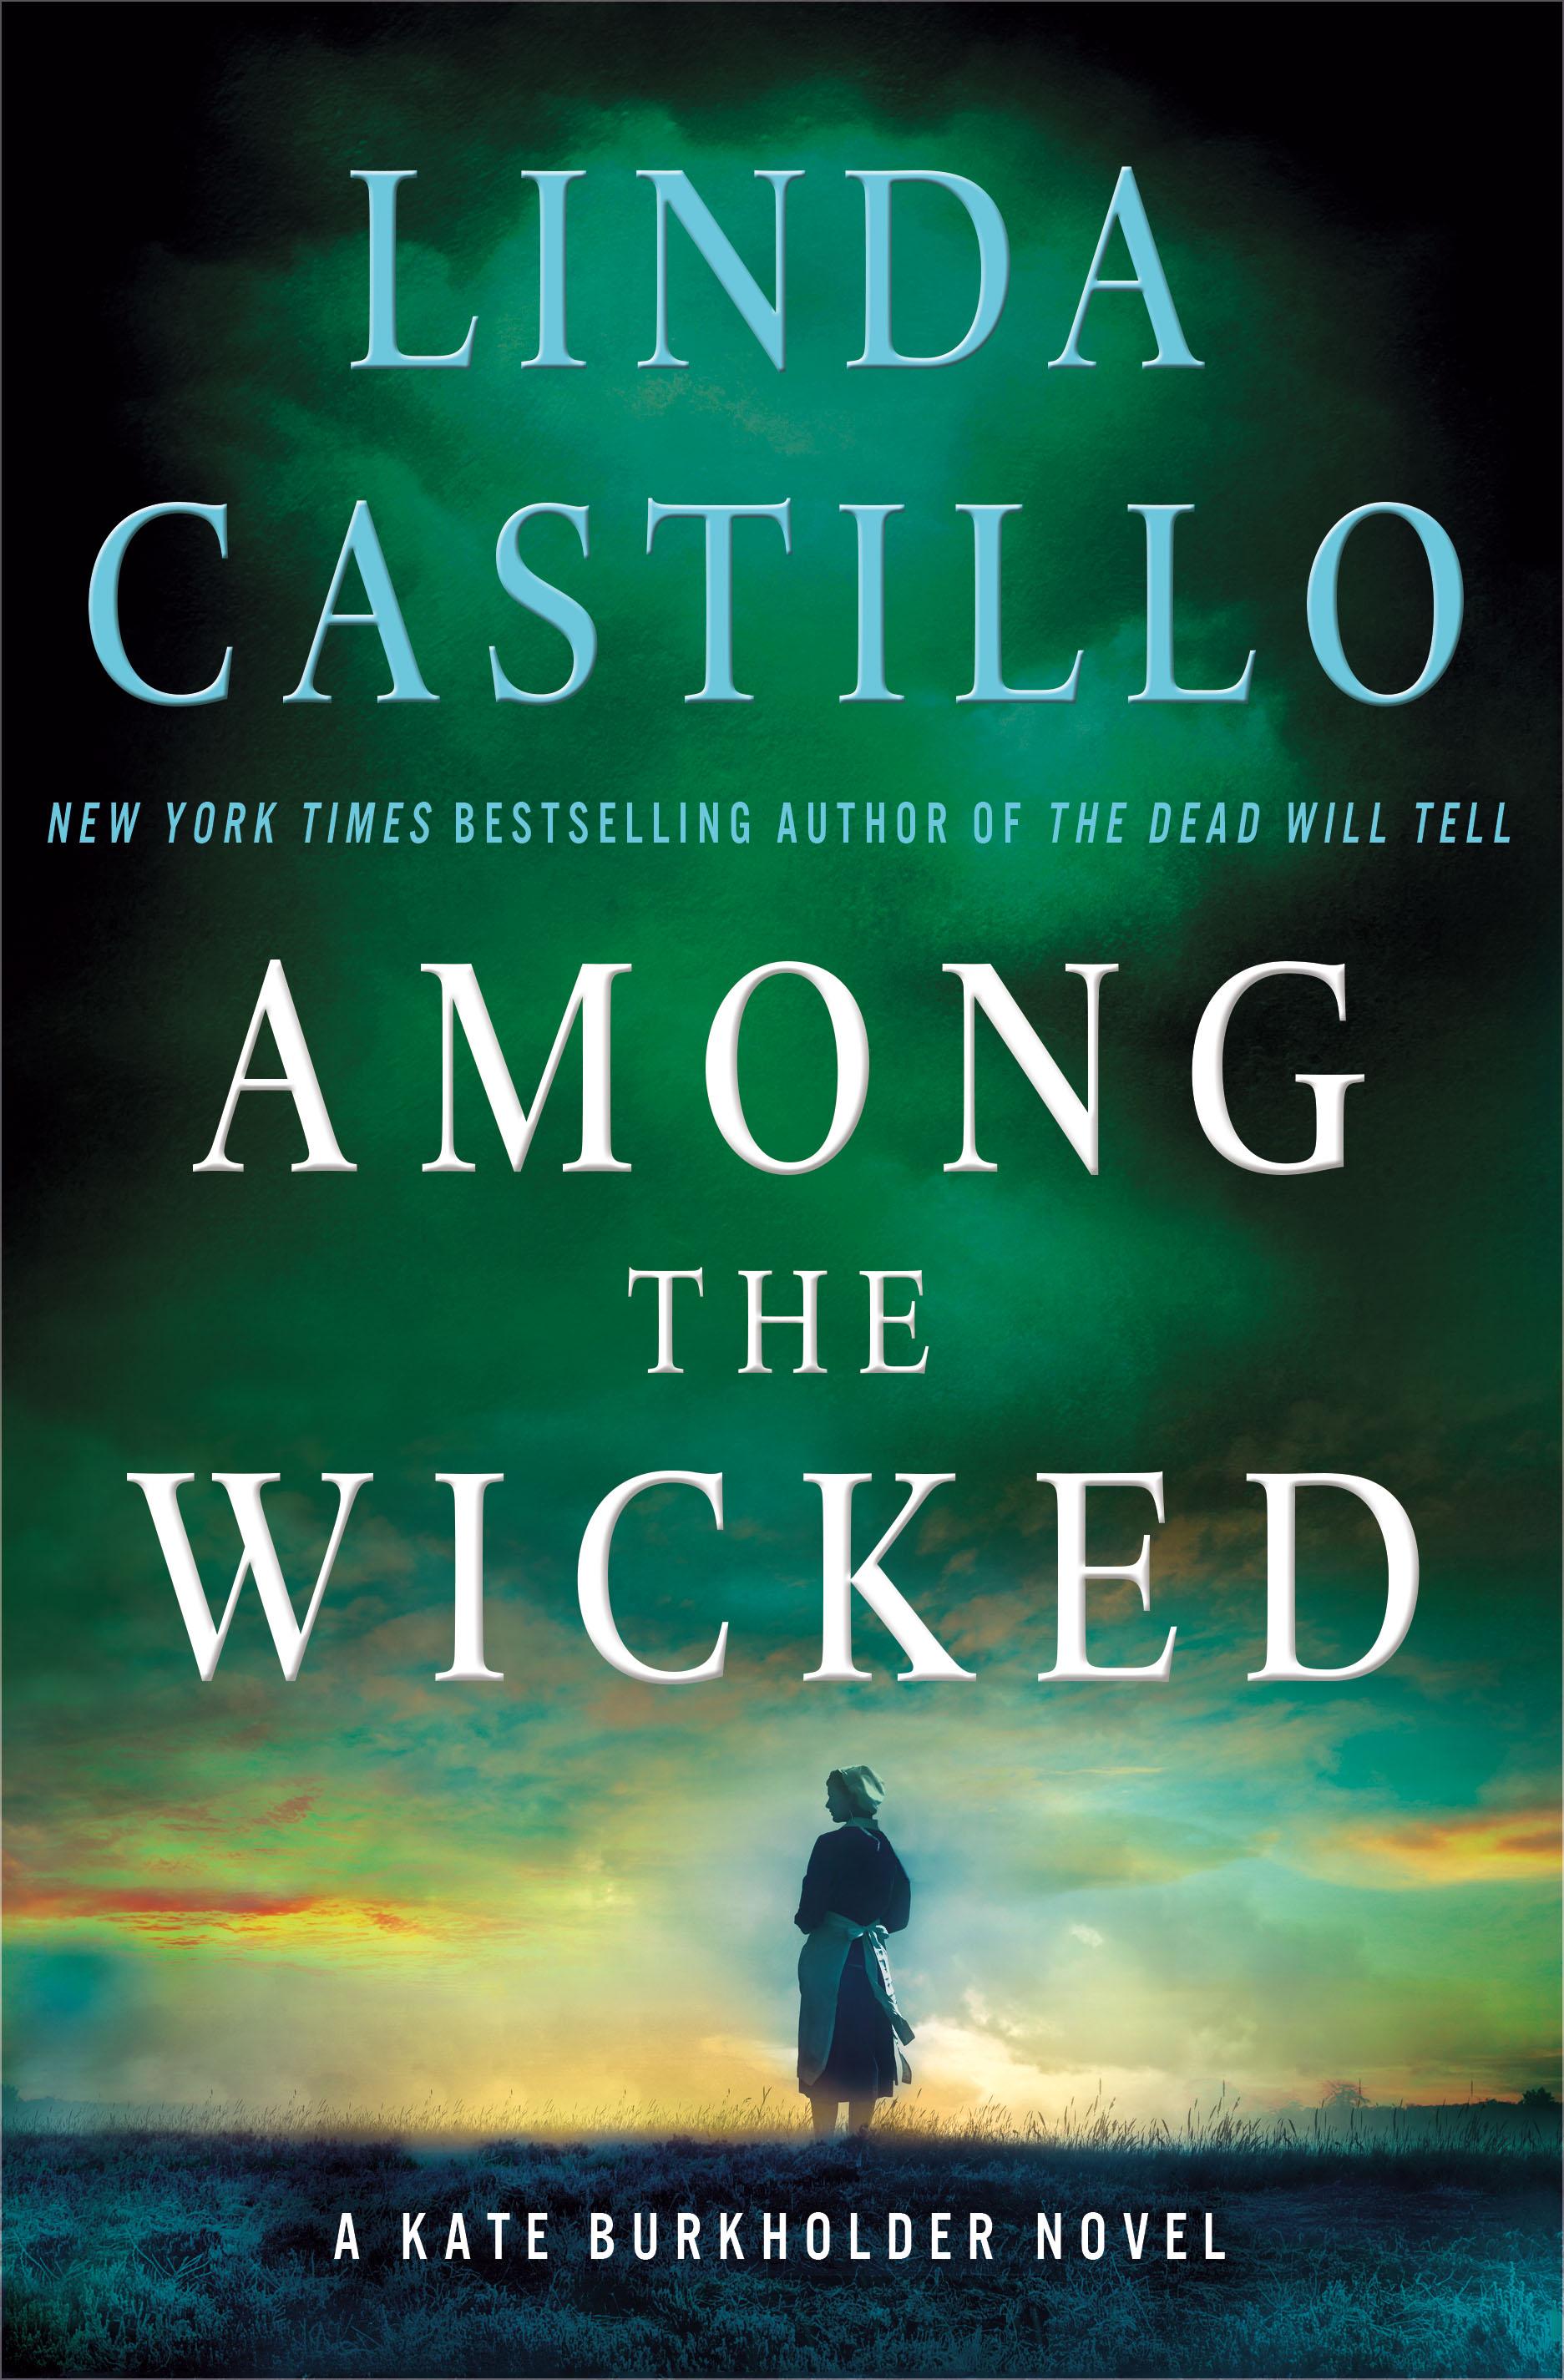 Among the Wicked A Kate Burkholder Novel